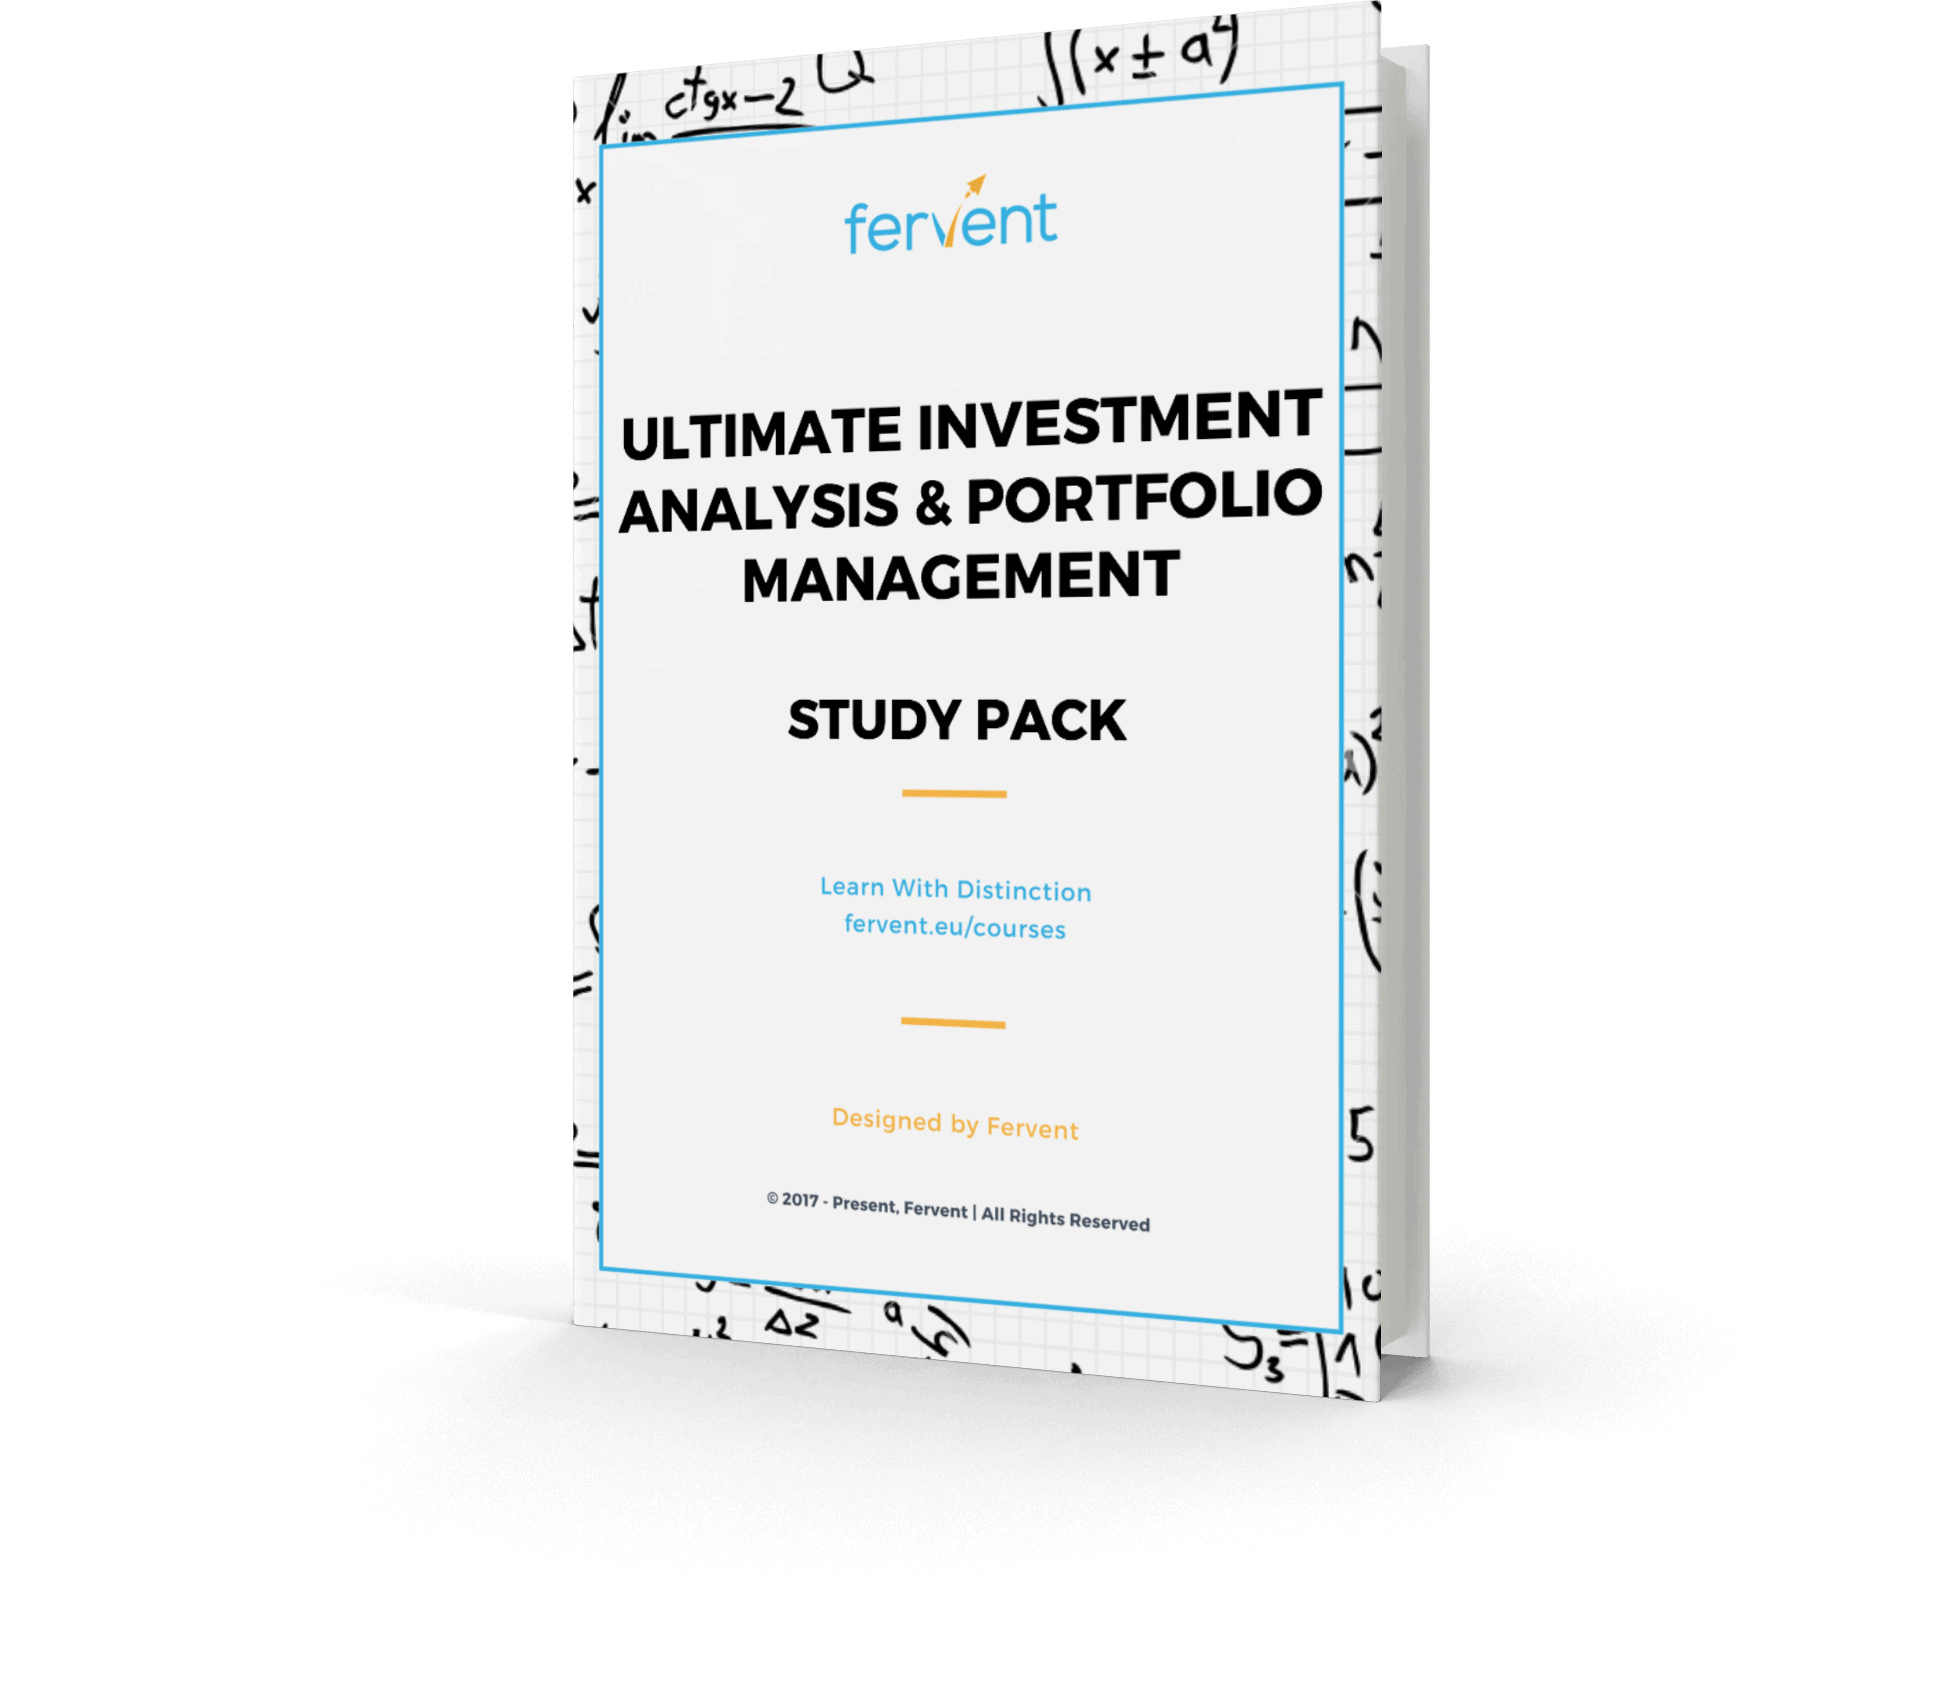 Ultimate Investment Analysis and Portfolio Management